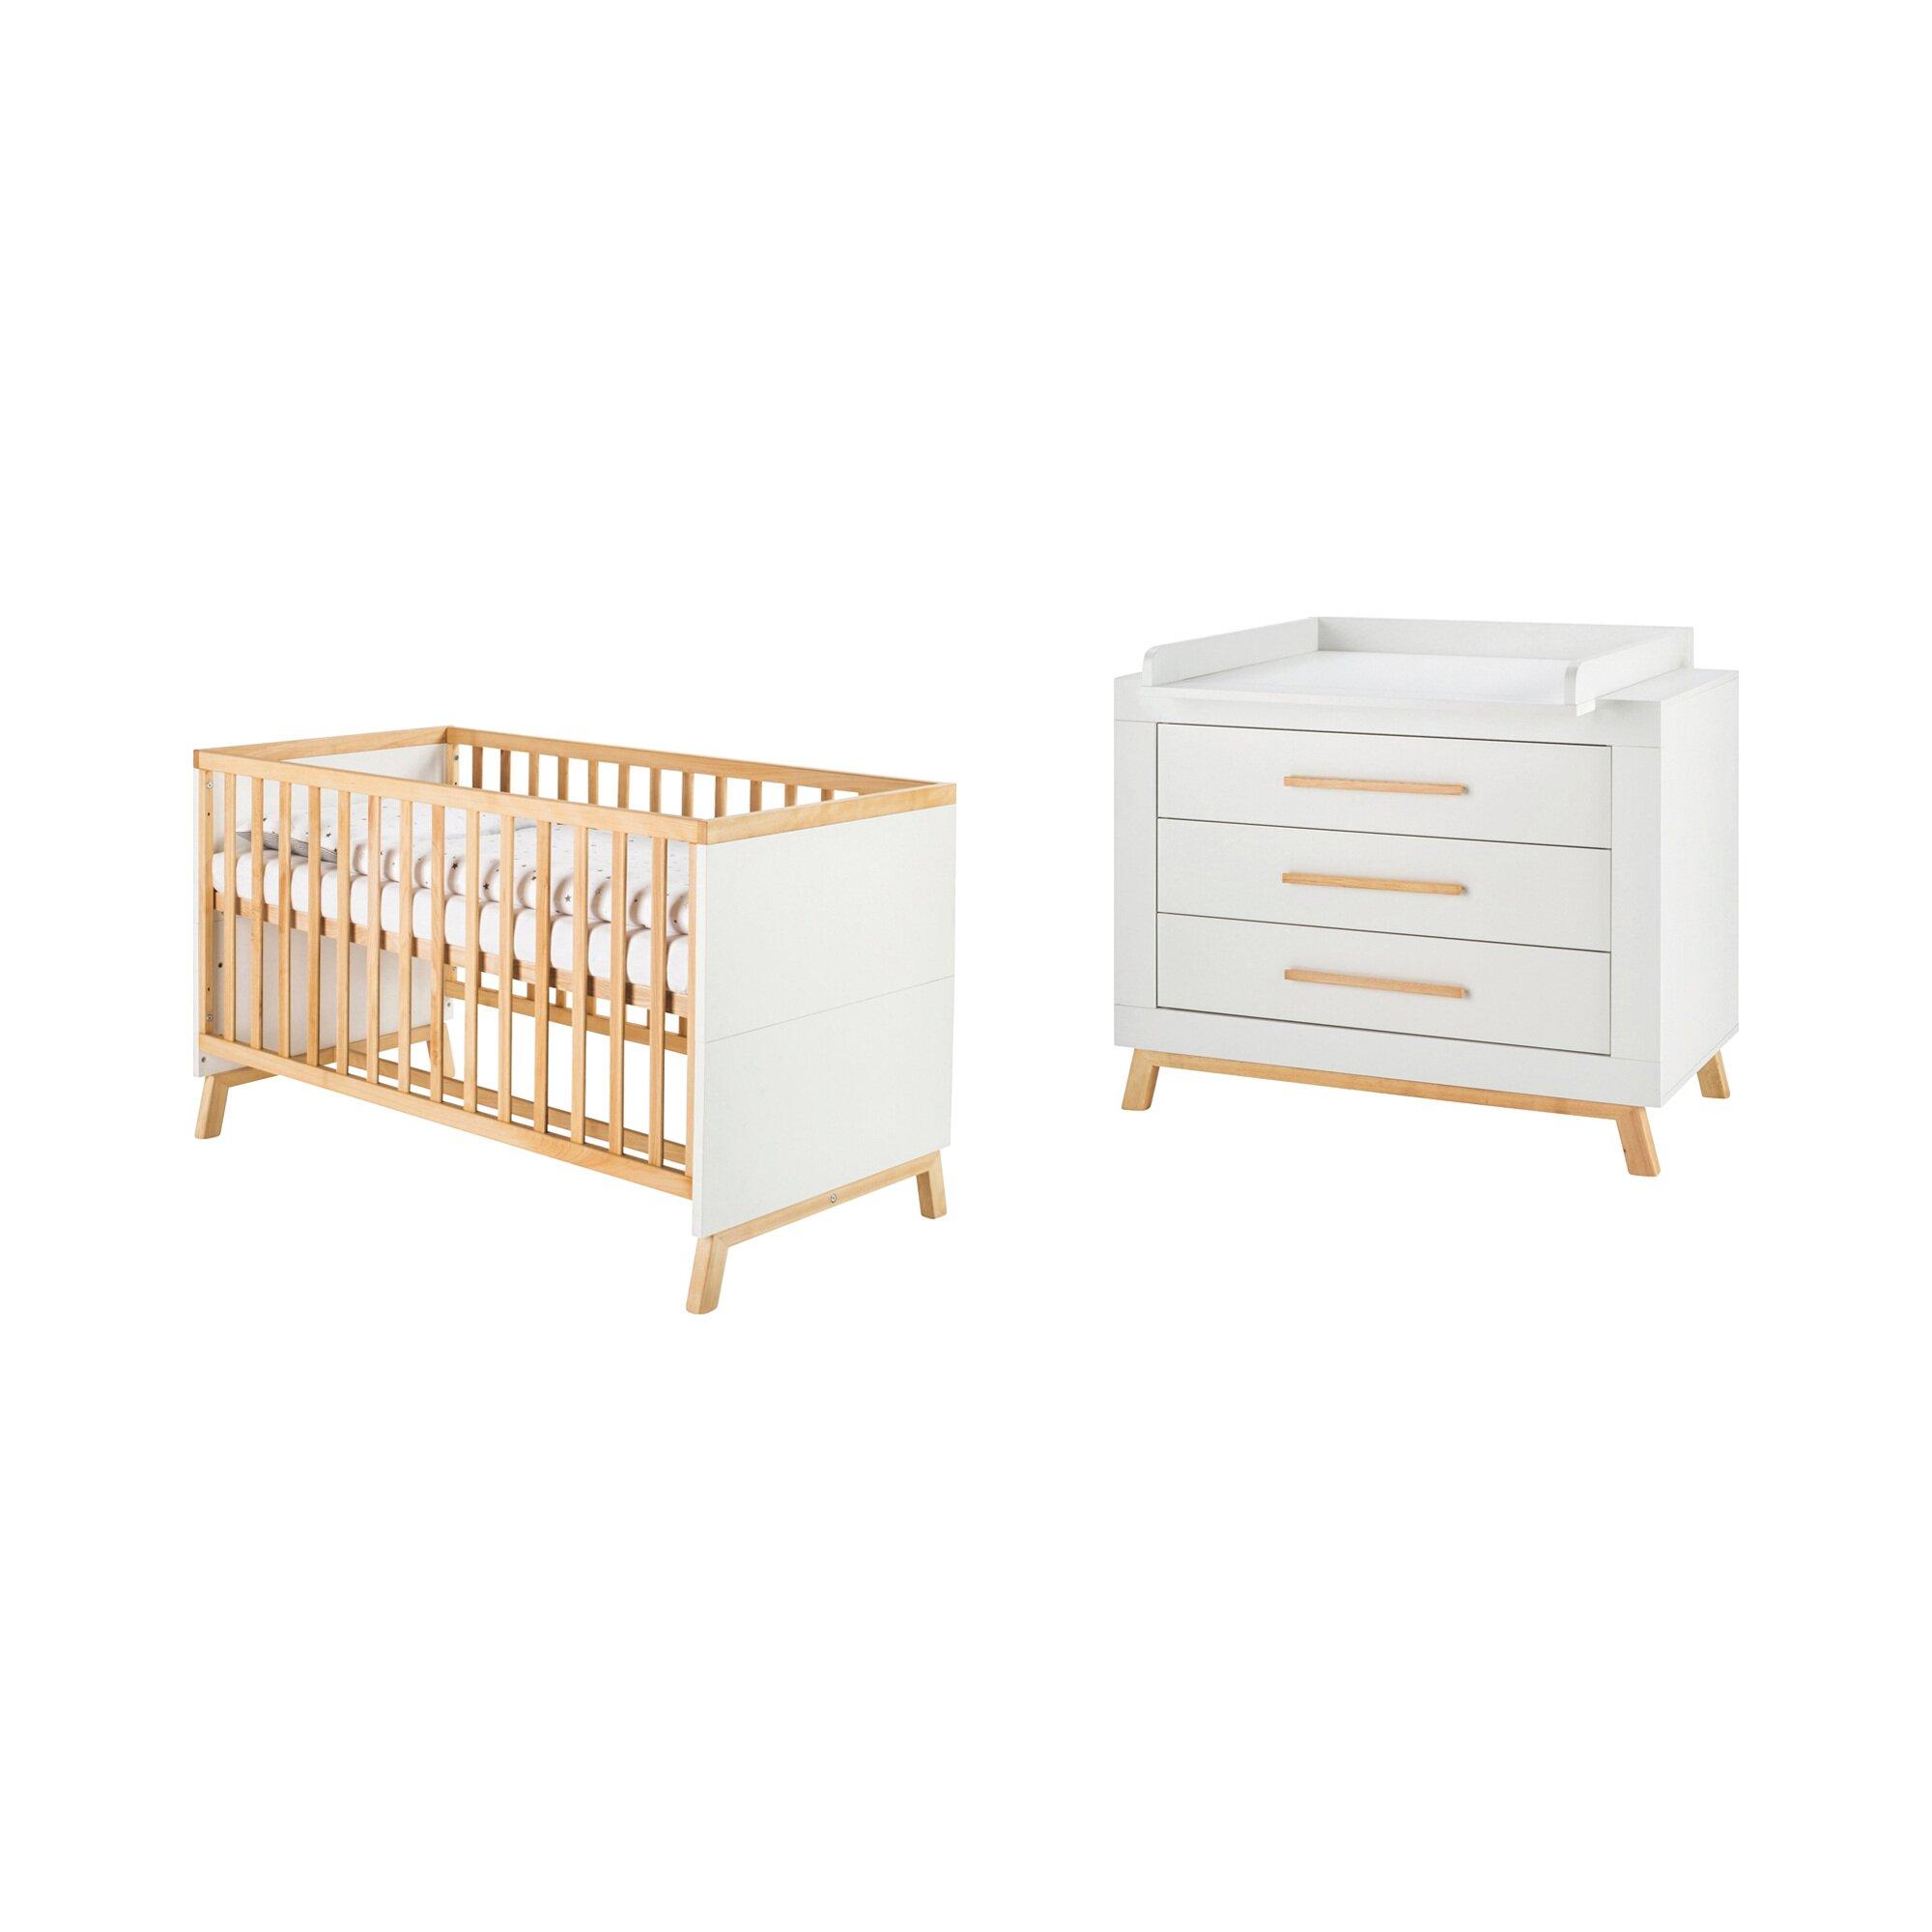 schardt-2-tlg-babyzimmer-miami-white